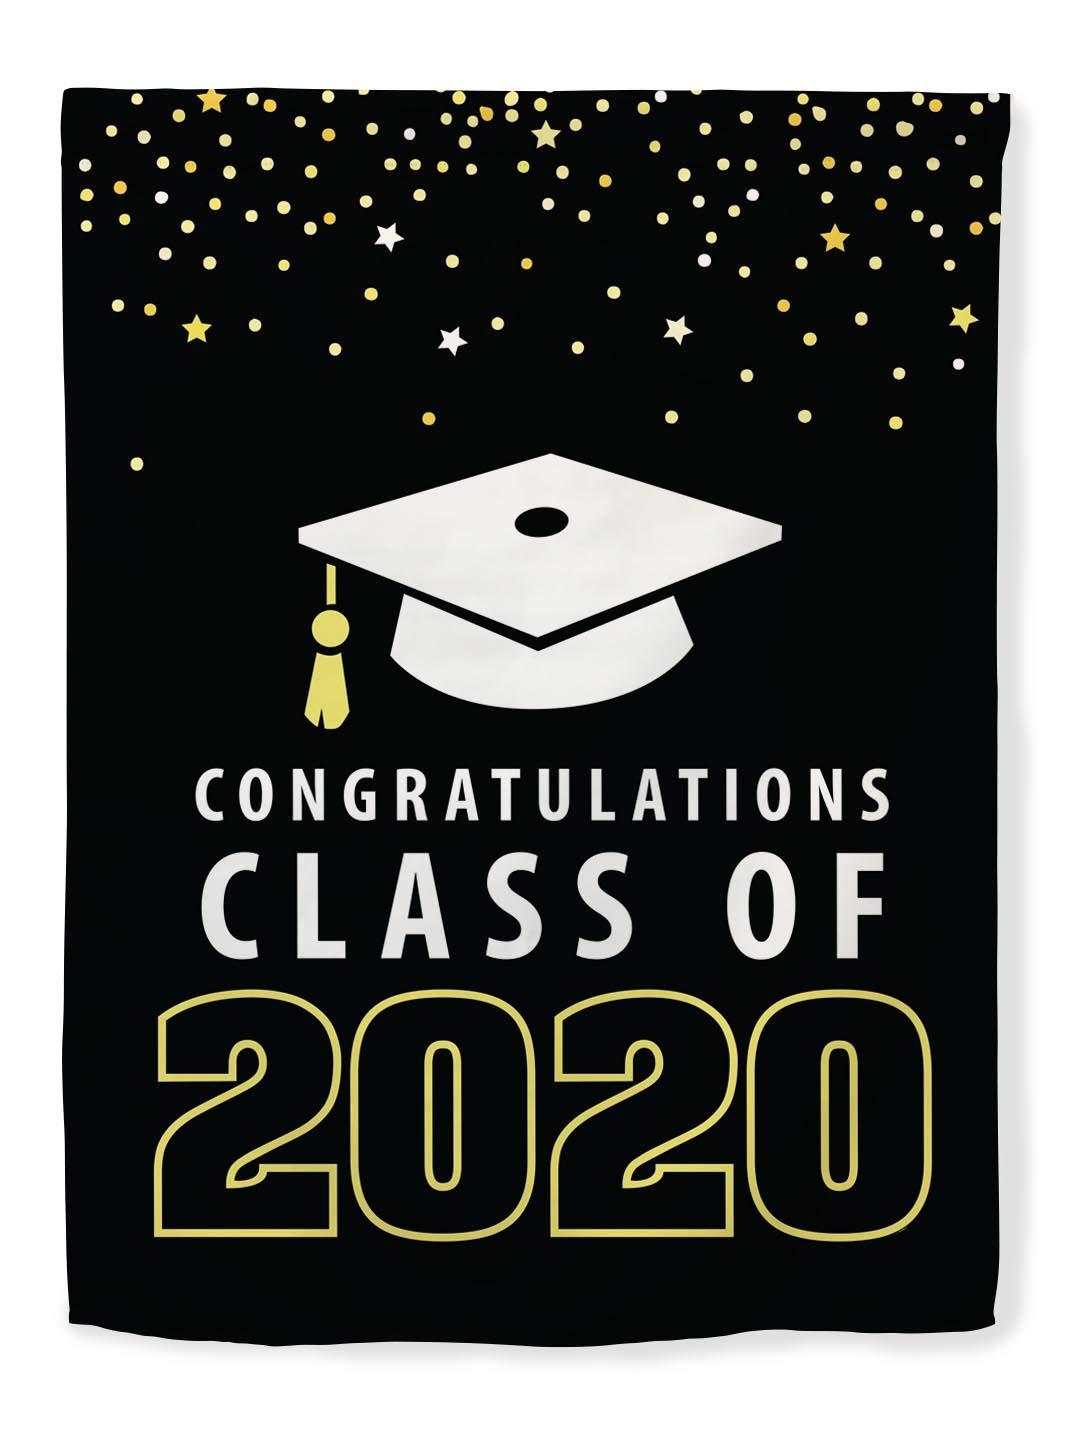 Graduation Centerpieces 2020.Thiswear Graduation Decor Congratulations Class Of 2020 Decorations Graduate Flag Vertical House Flag Grad